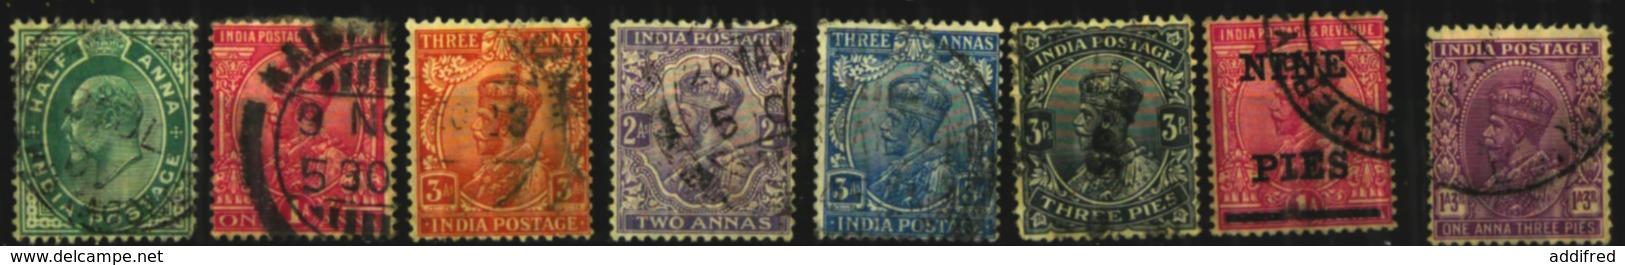 Inde Scott N°61.82.86.84.113.80.104.136..oblitérés - 1902-11 King Edward VII